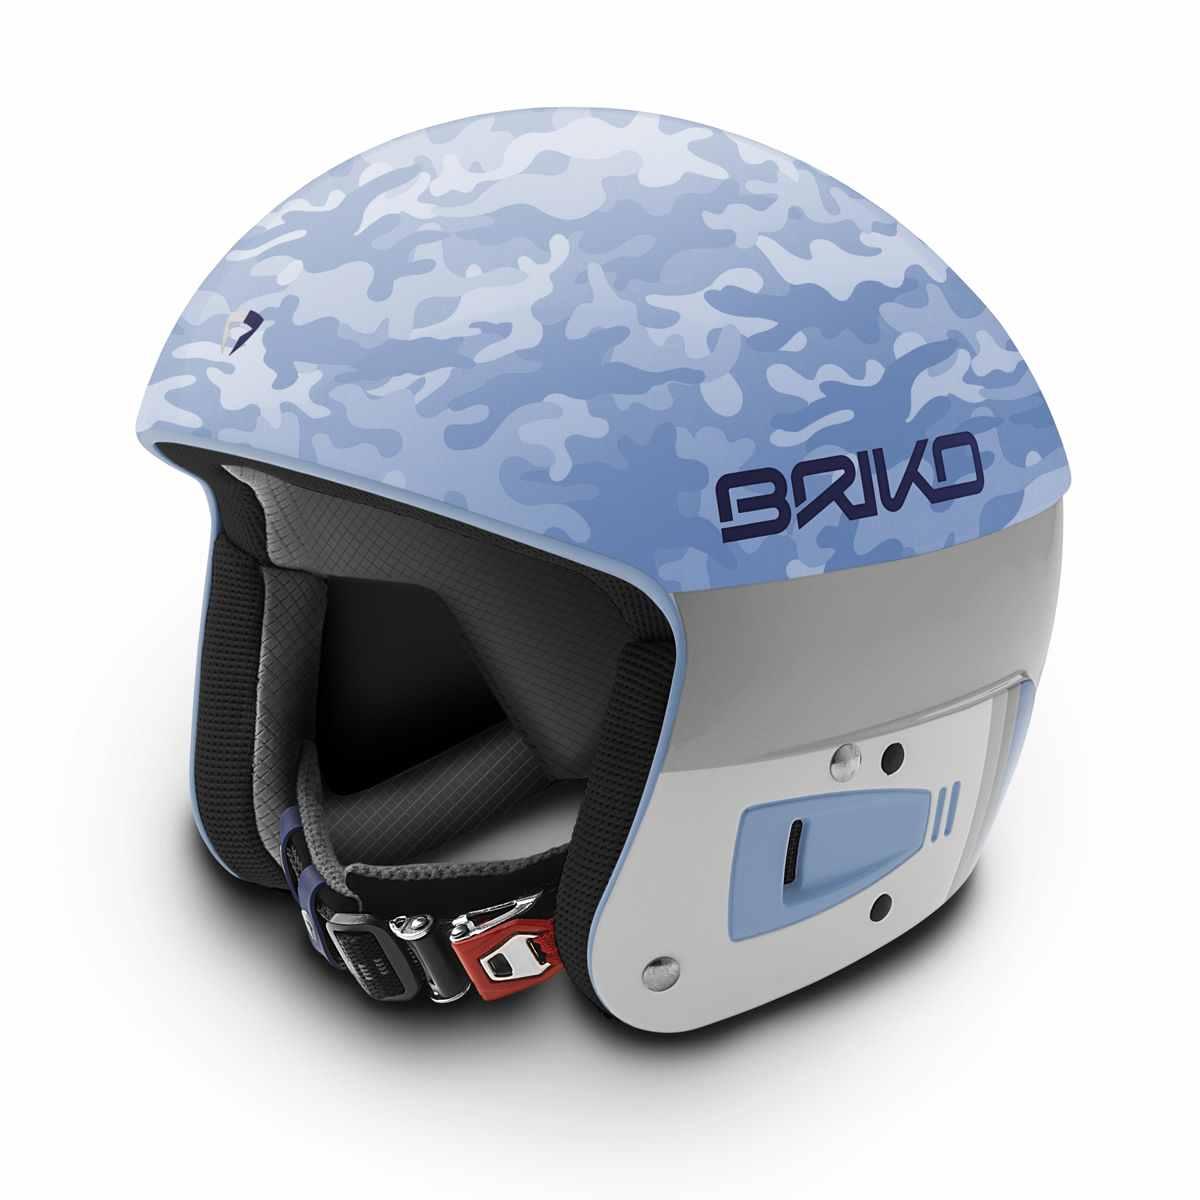 Ski   Snow Helmet - briko VULCANO FIS 6.8 JR  c90c4f46d07